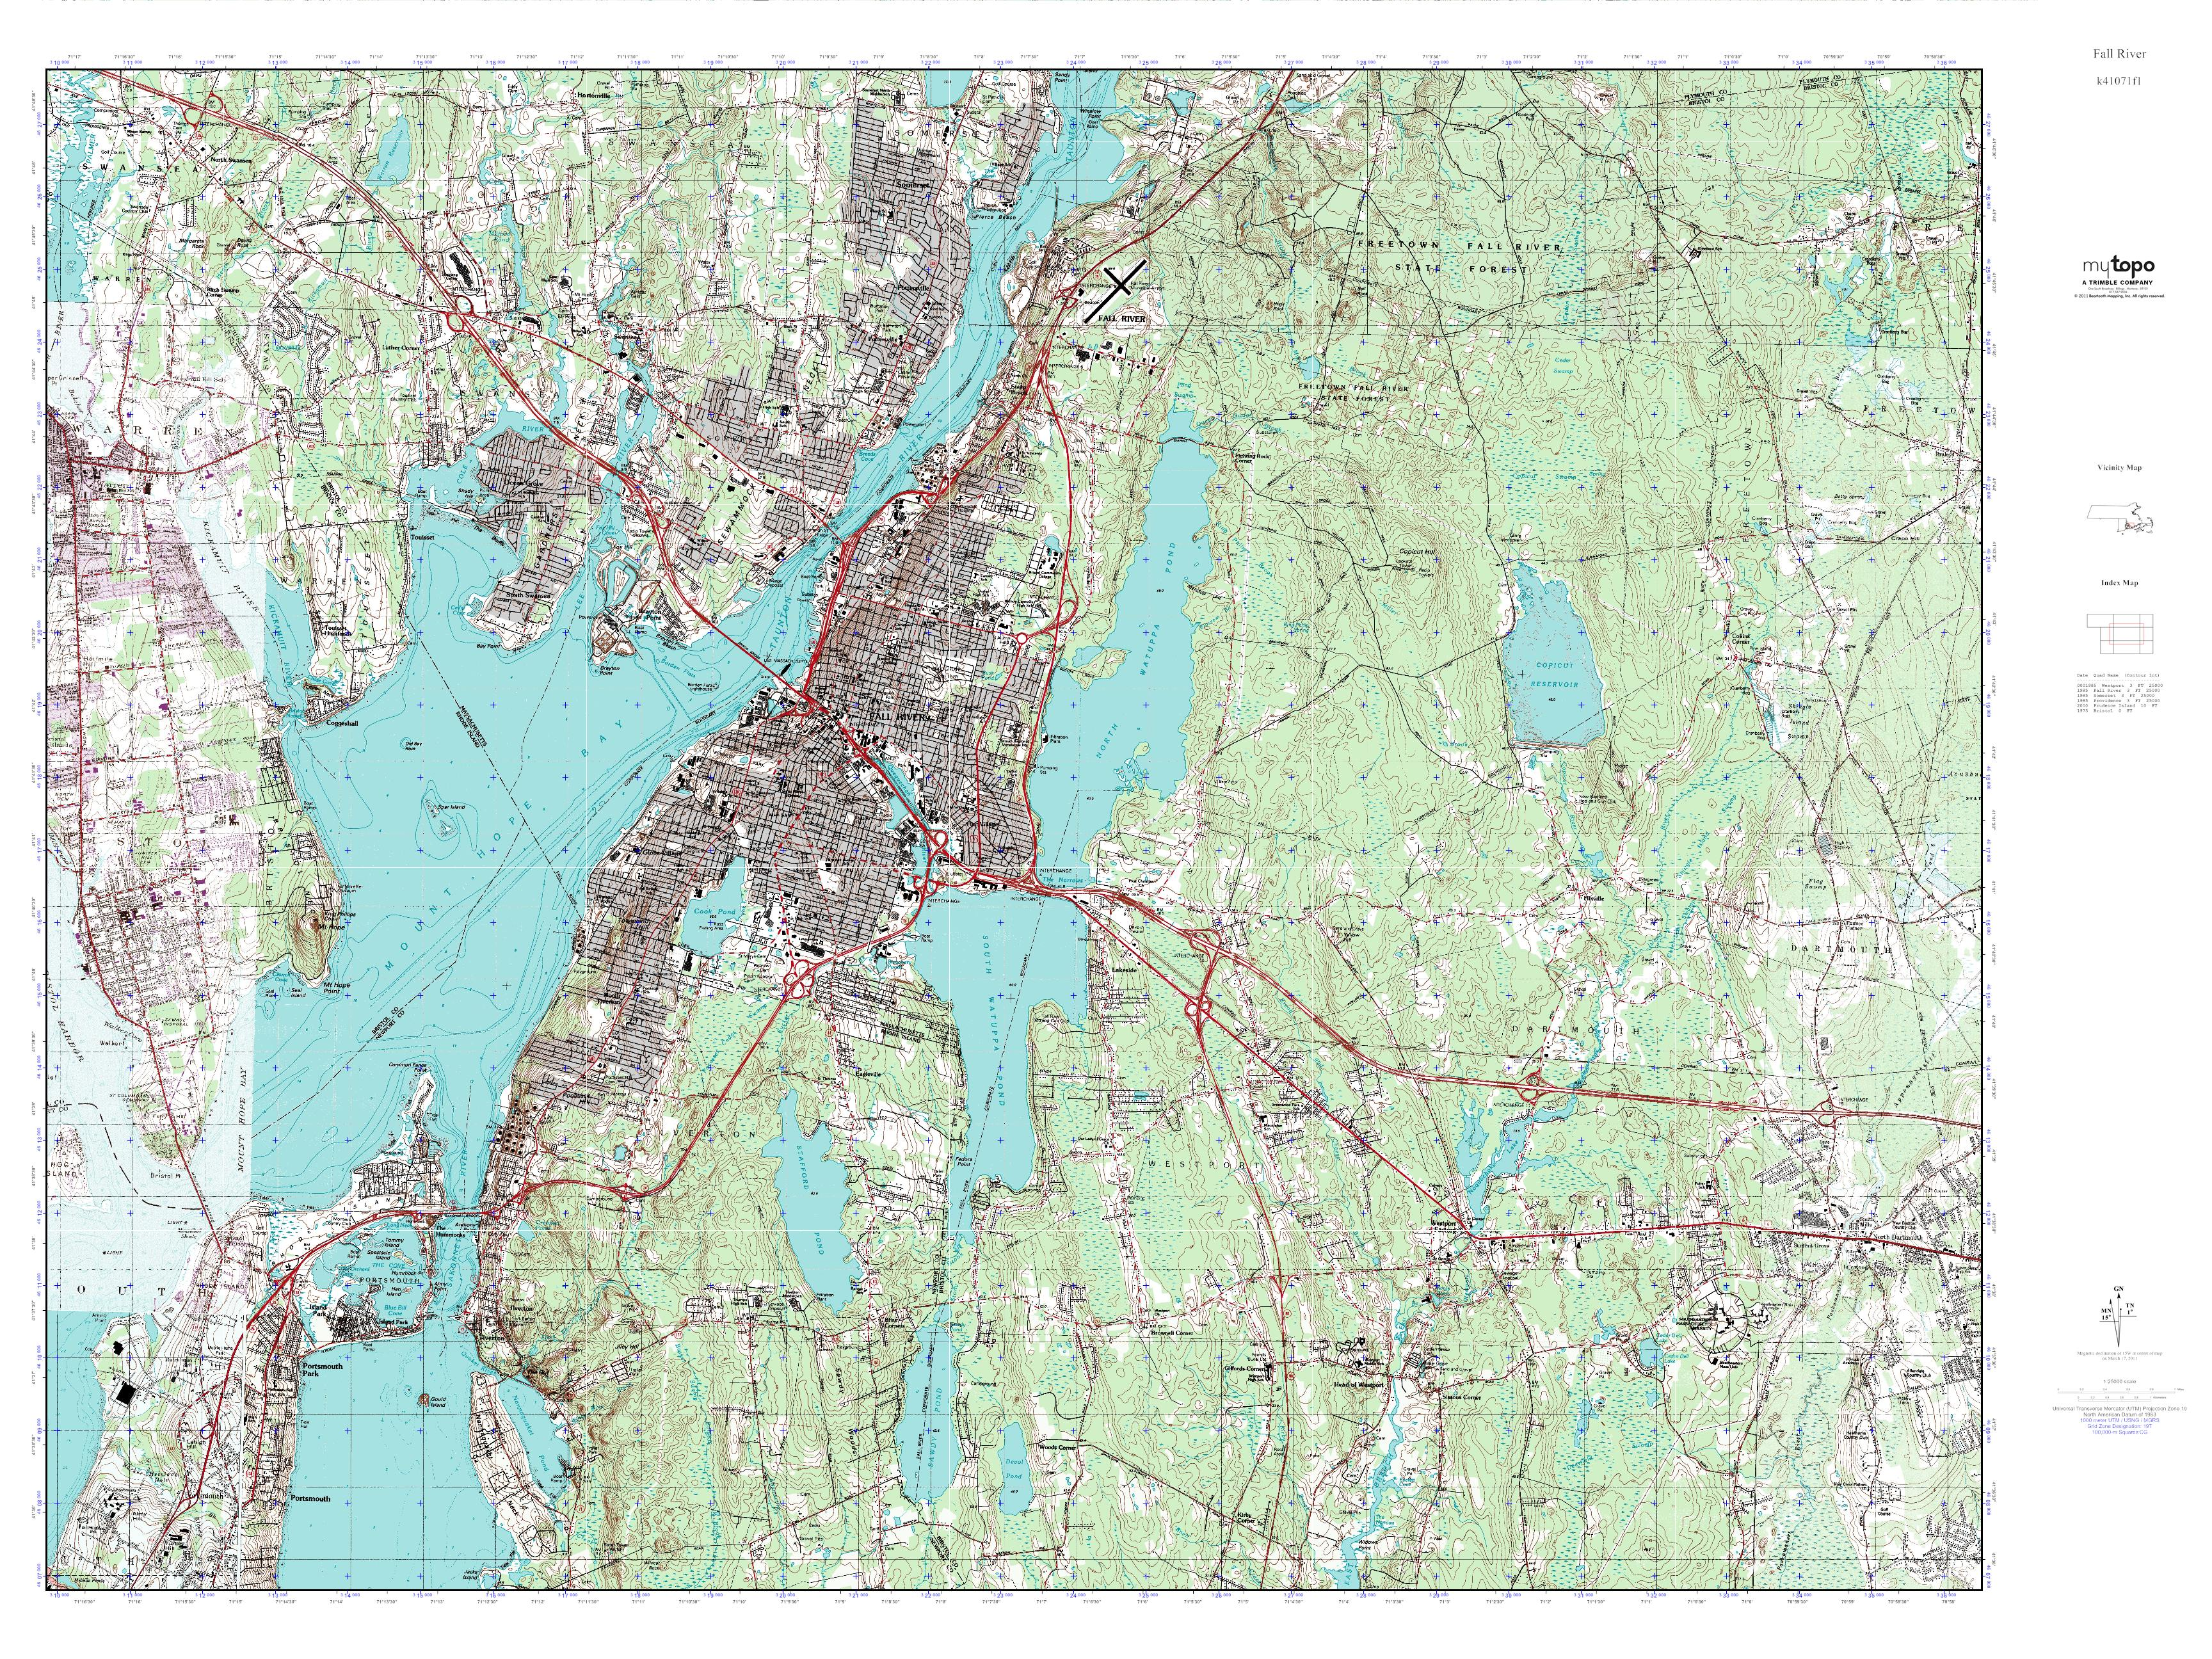 Fall River County South Dakota USGS Topographic Maps on CD